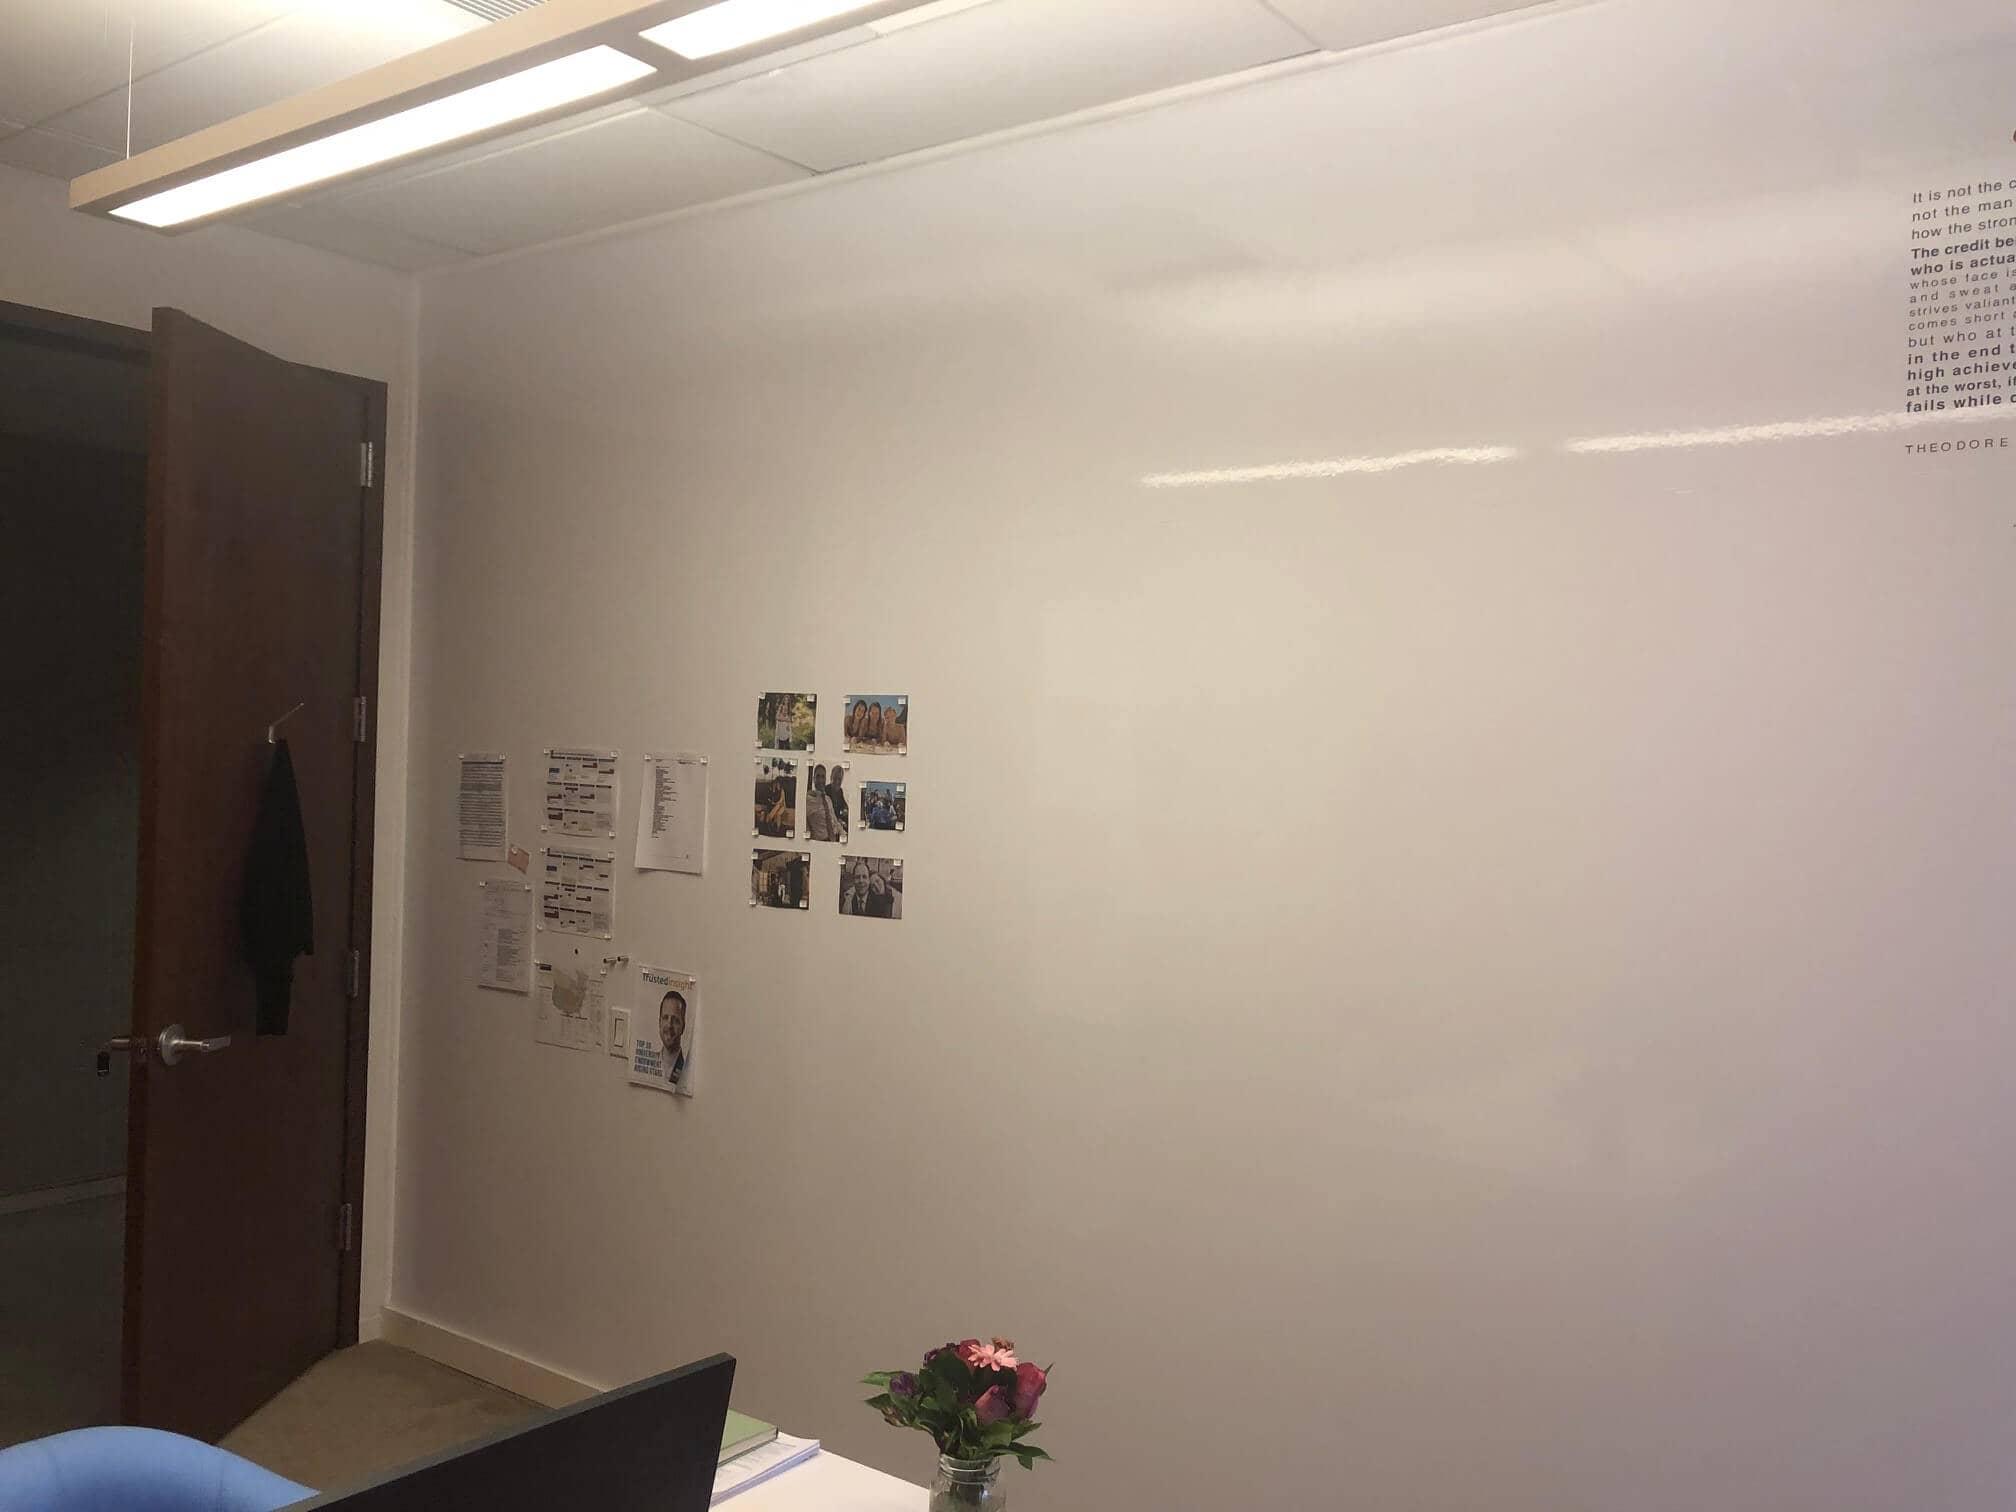 Alterity whiteboard wall